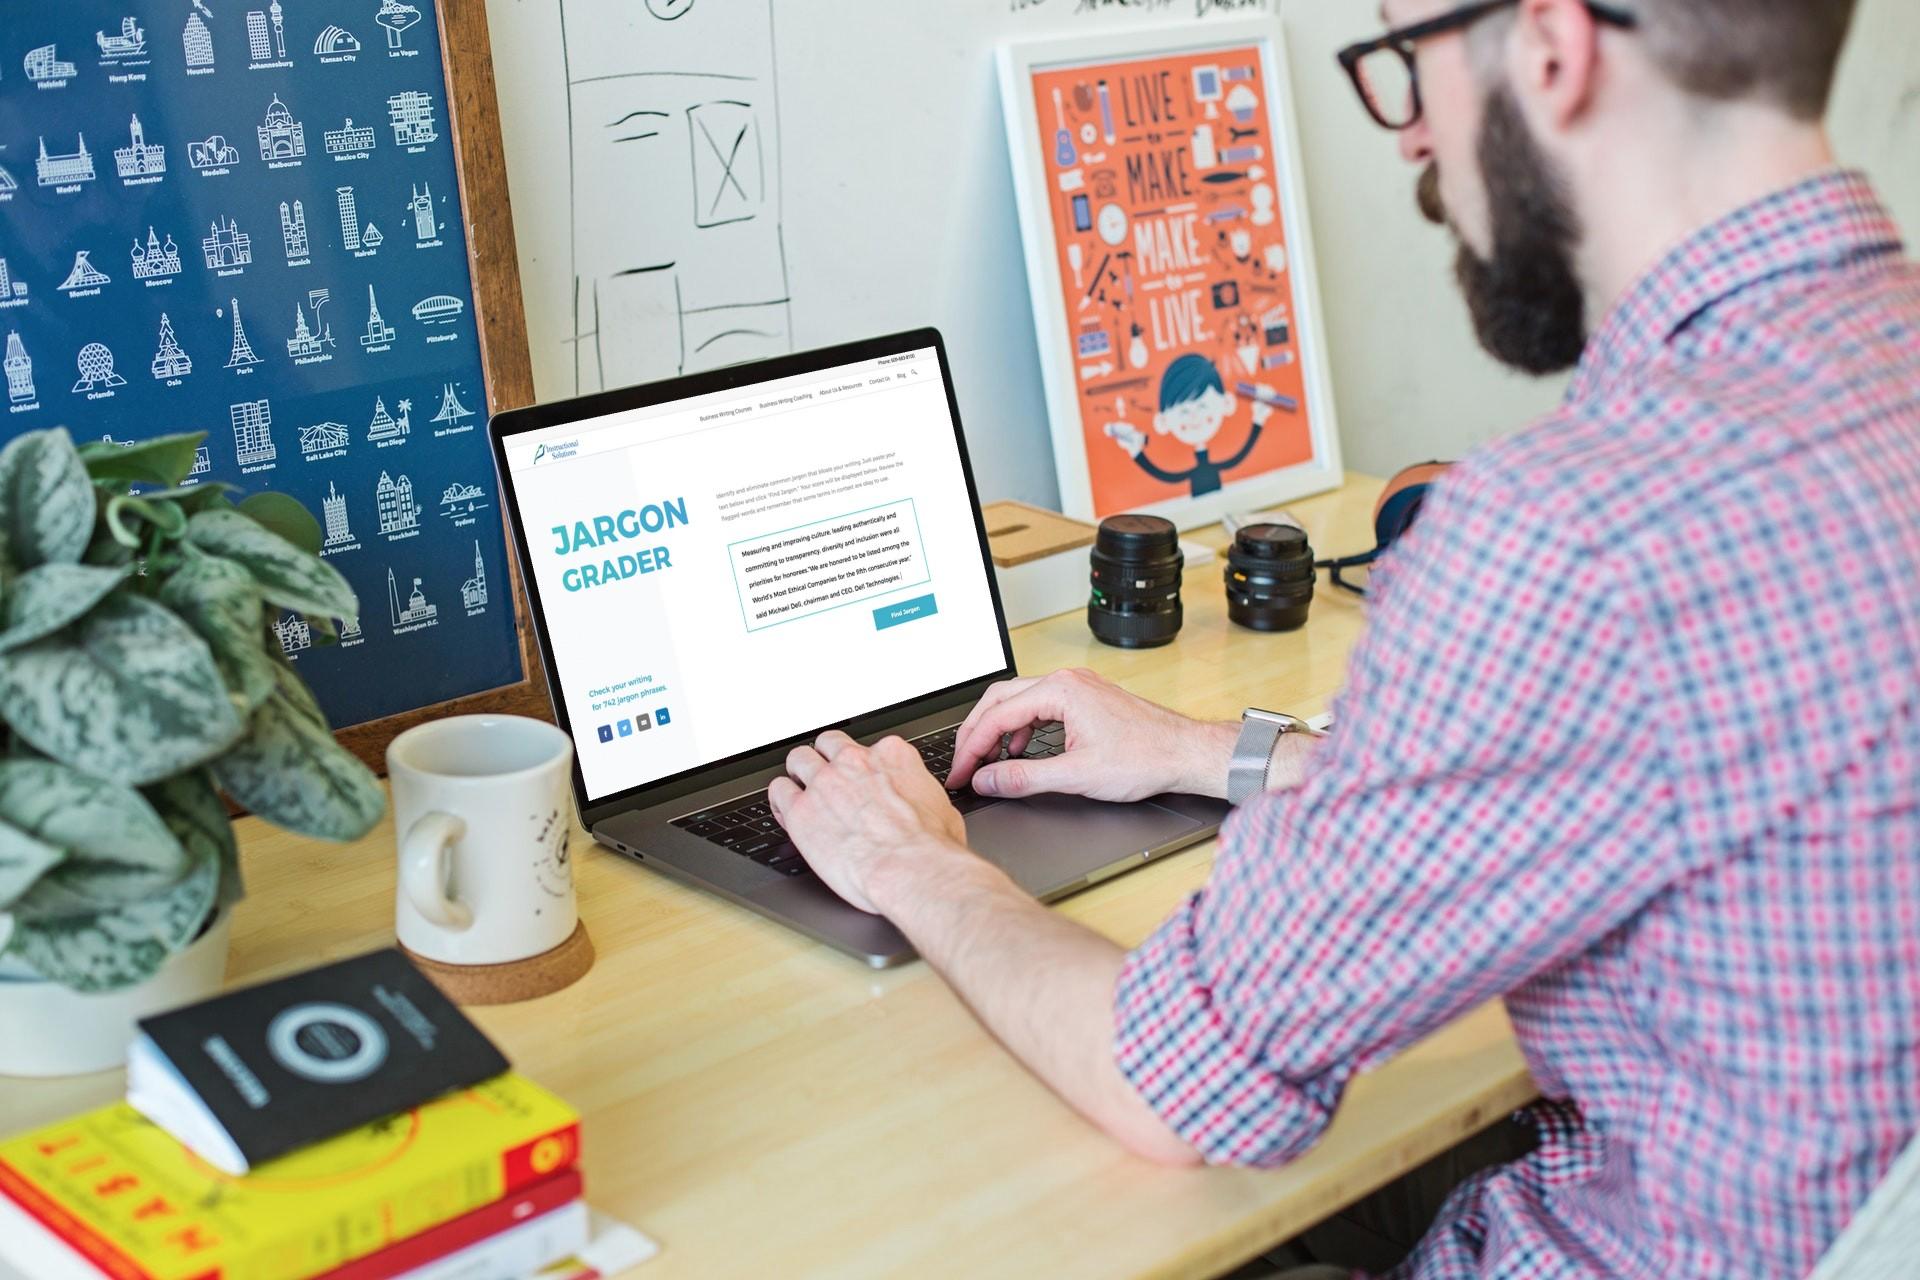 jargon grader and man typing